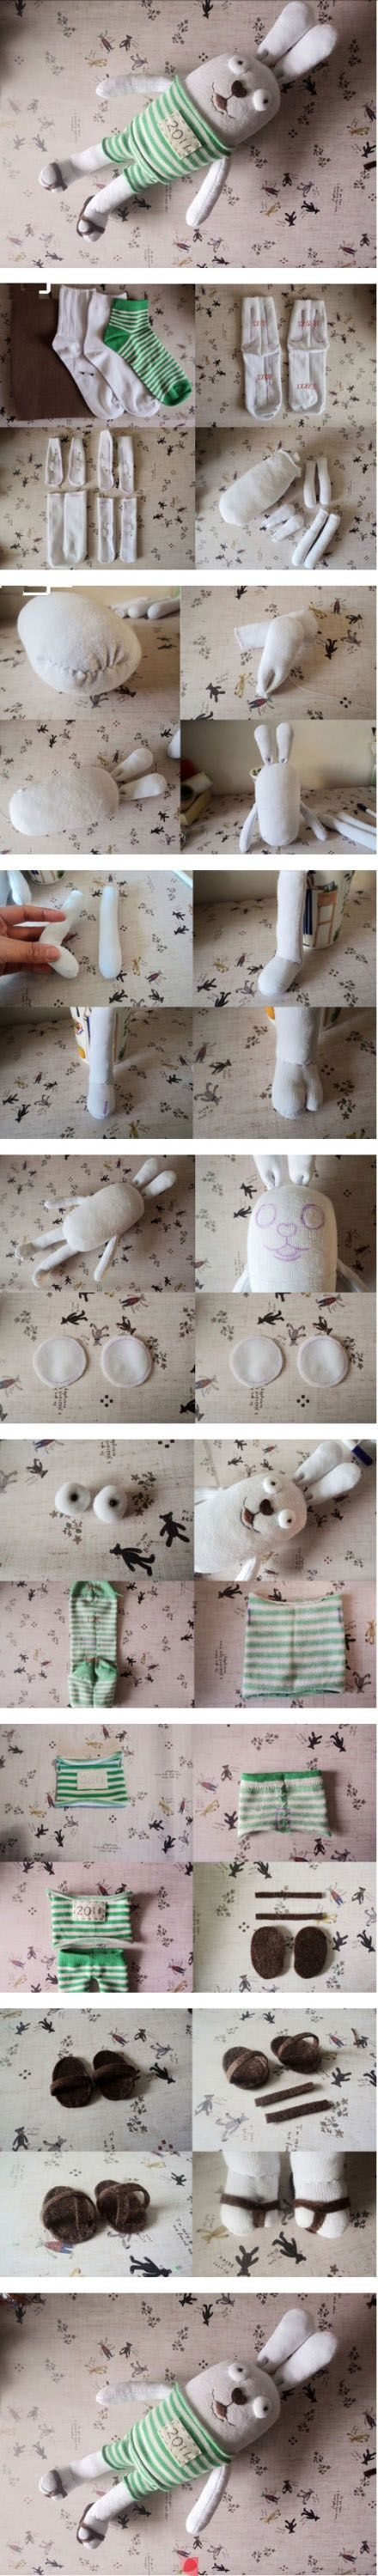 Socks = Rabbit